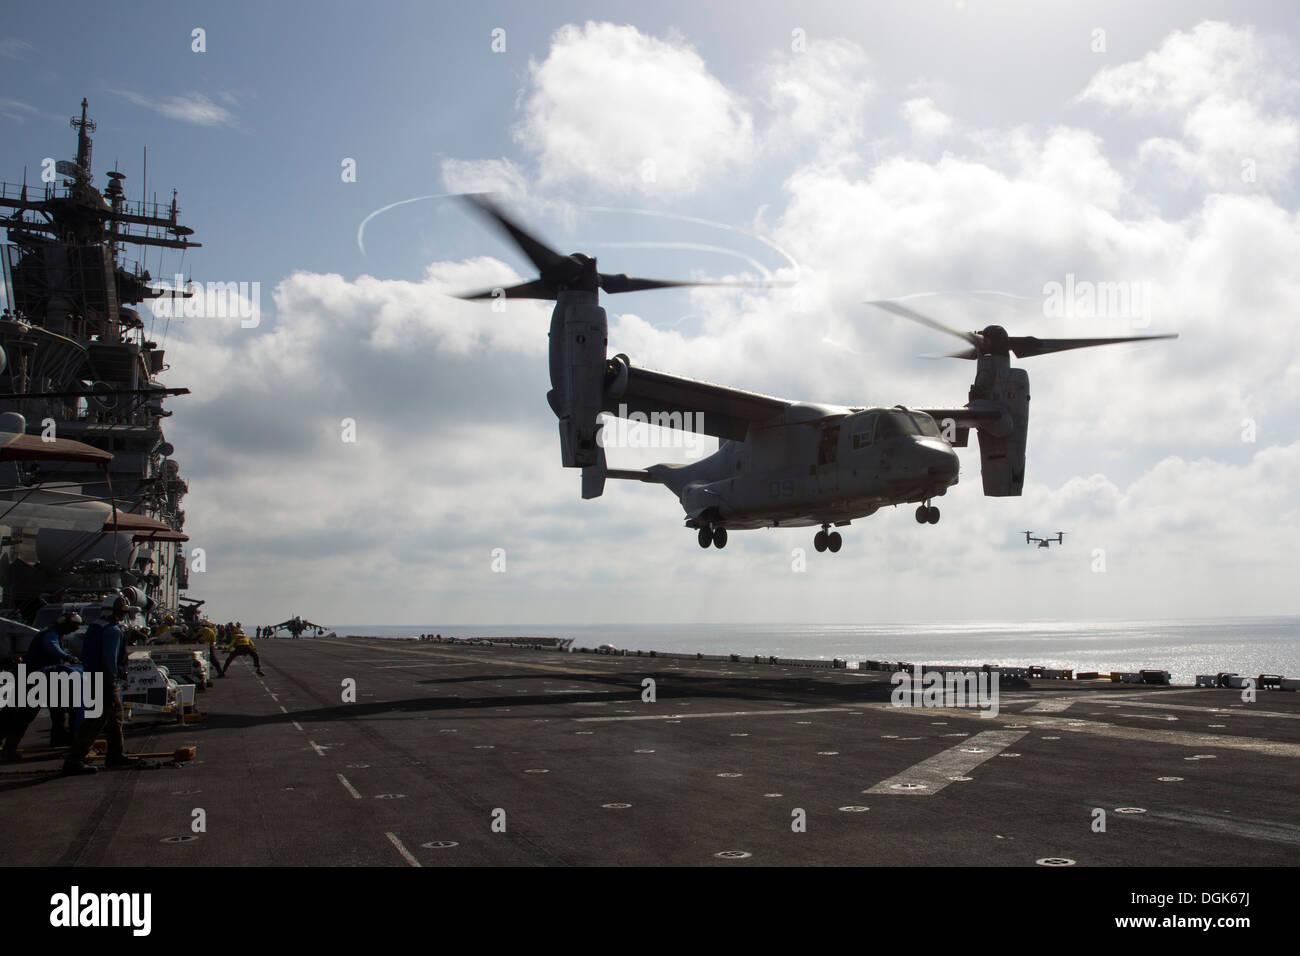 An MV-22 Osprey from Marine Medium Tiltrotor Squadron (VMM) 266 (Reinforced) lands on the flight deck of the amphibious Stock Photo